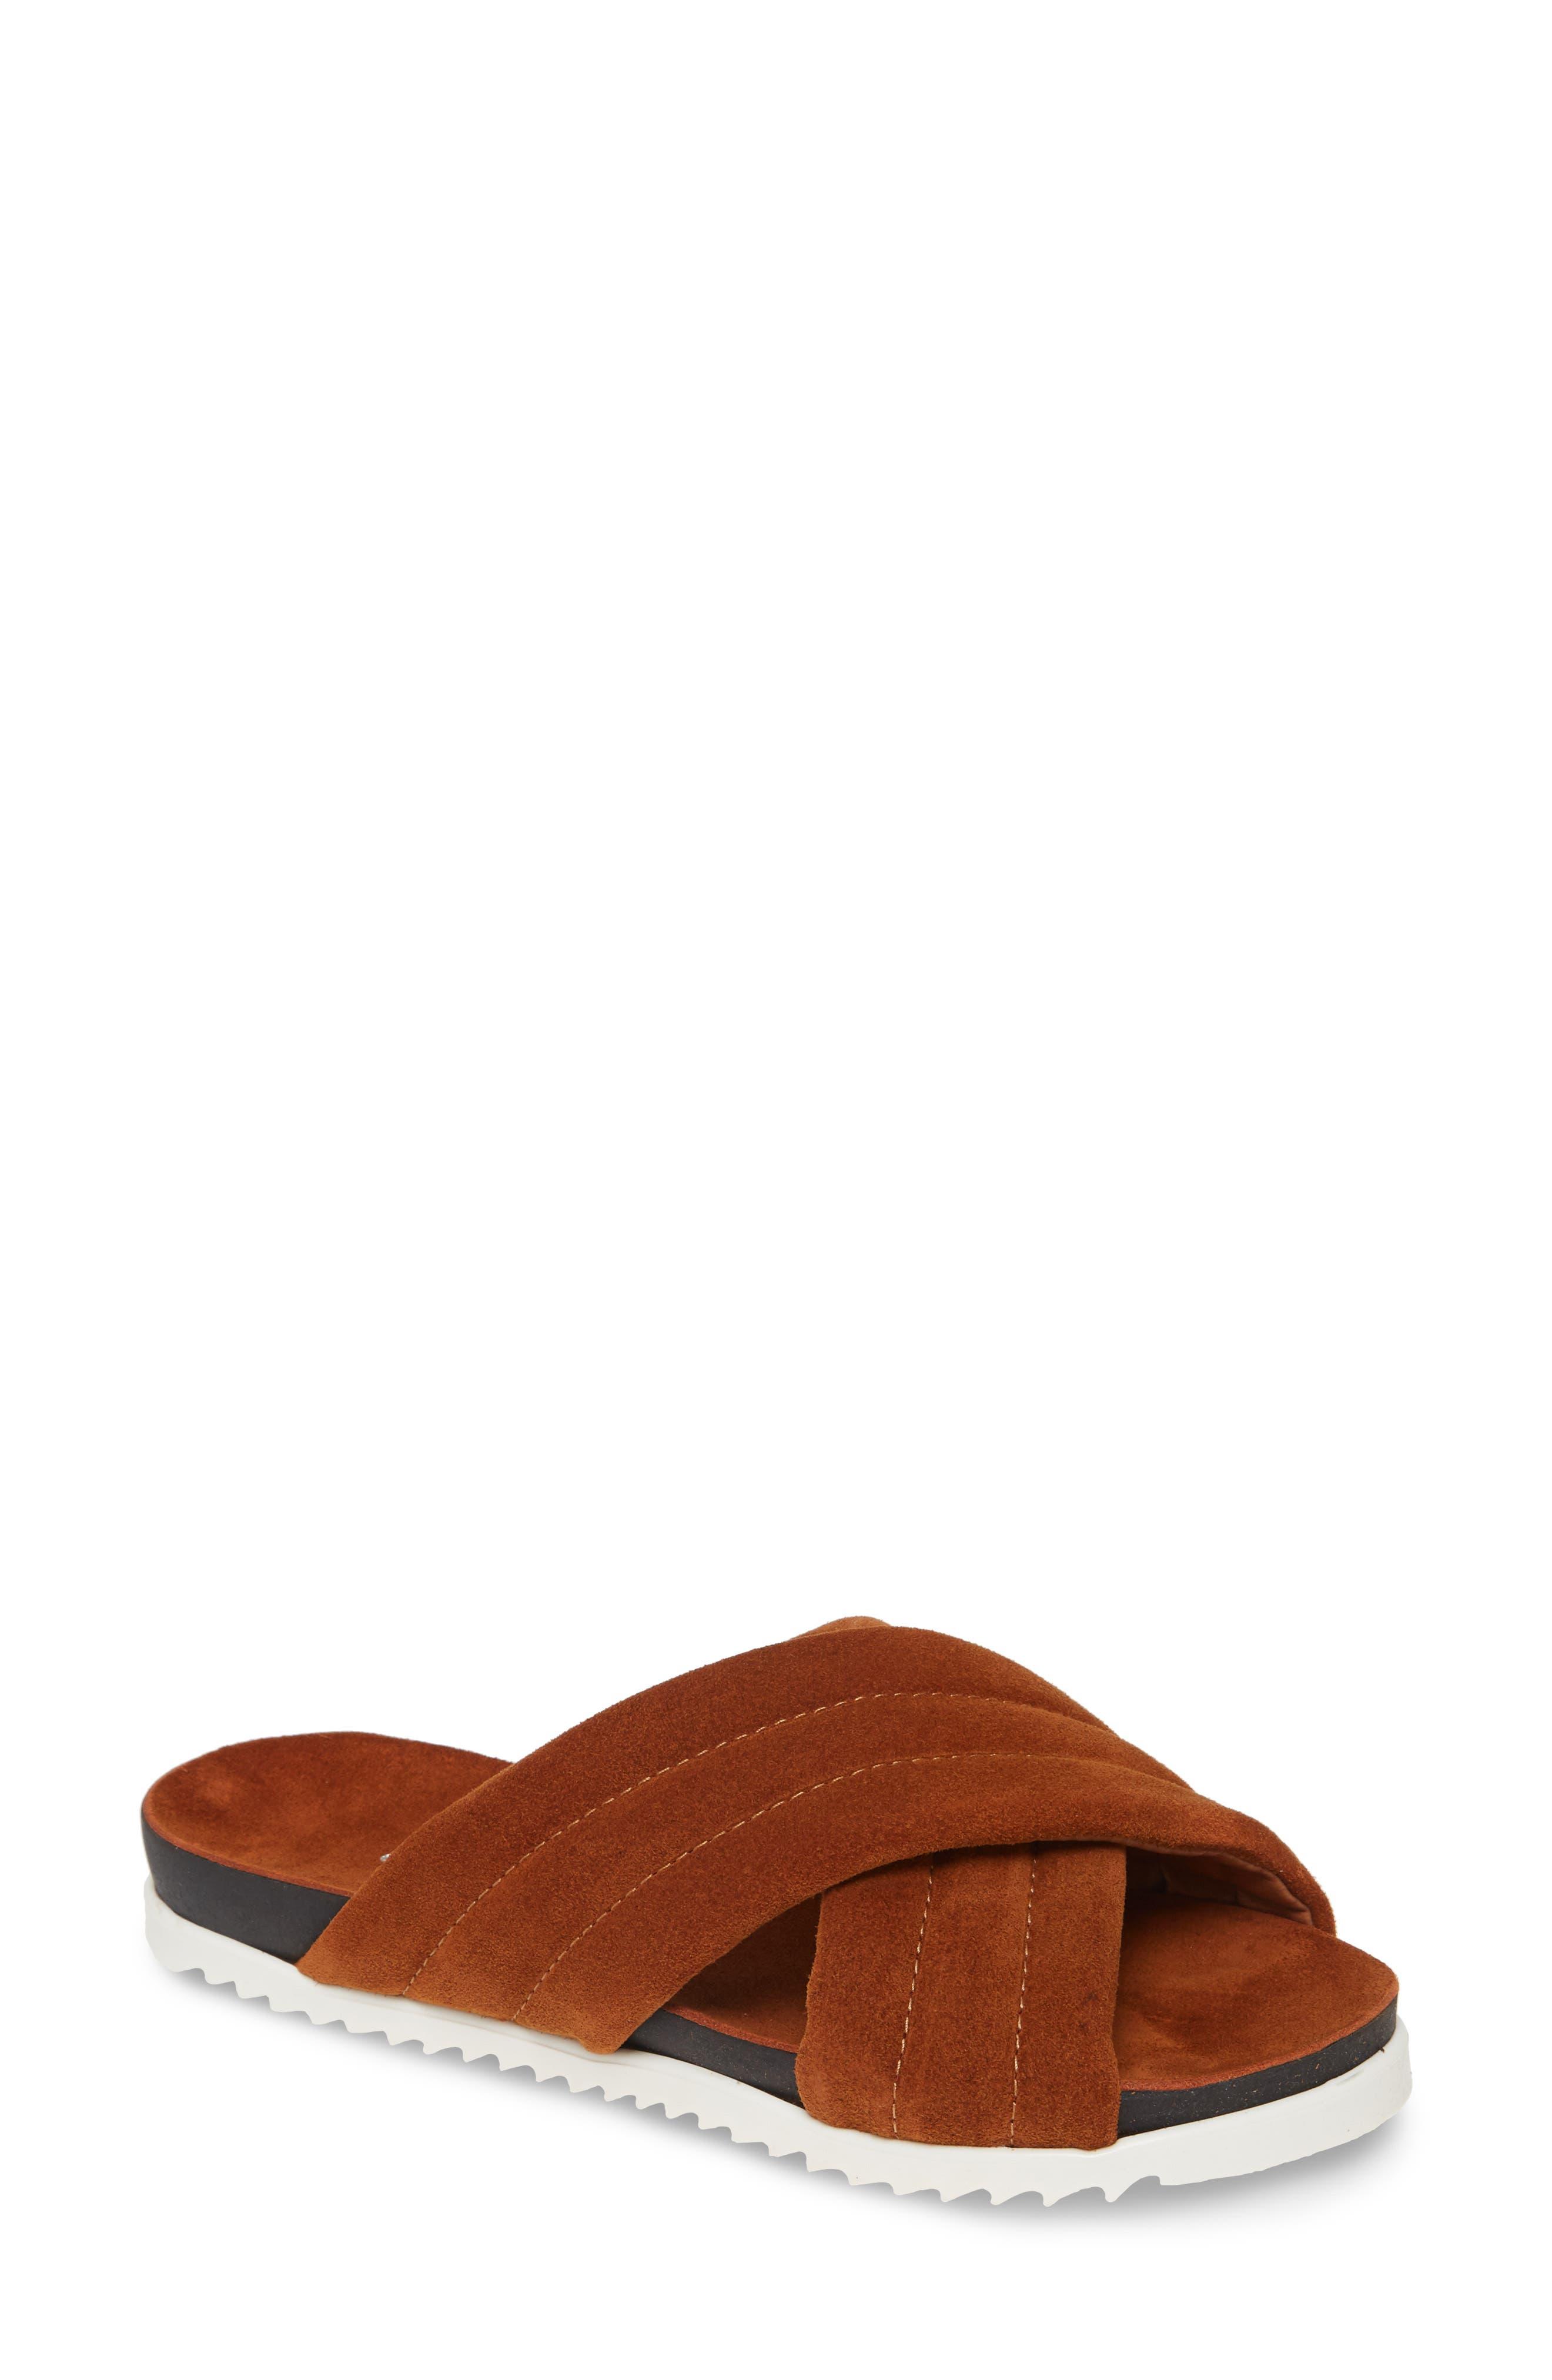 Lye Slide Sandal